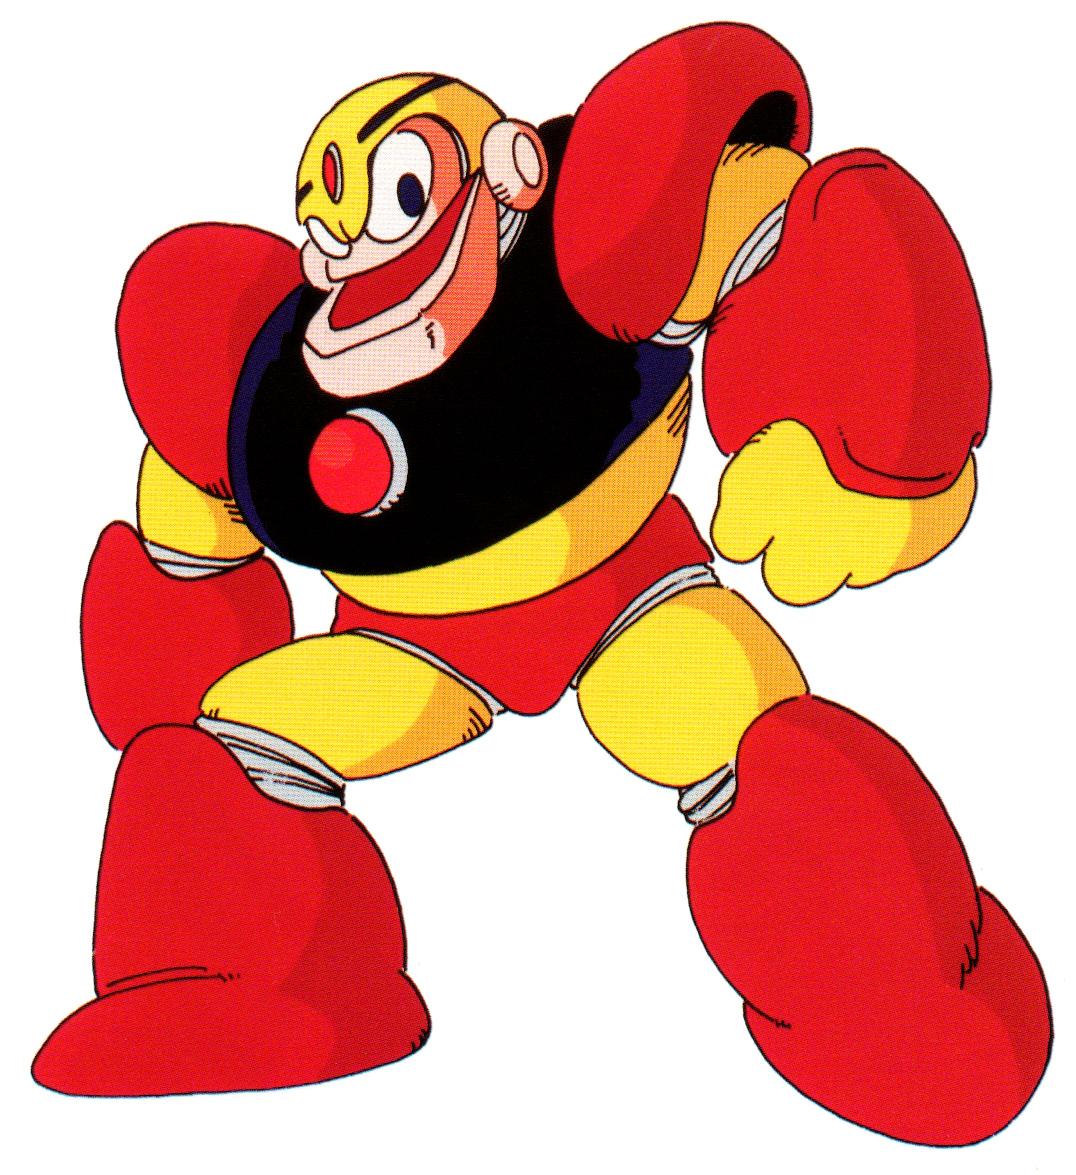 Images of Guts Man - MMKB, the Mega Man Knowledge Base - Mega Man 10 ...